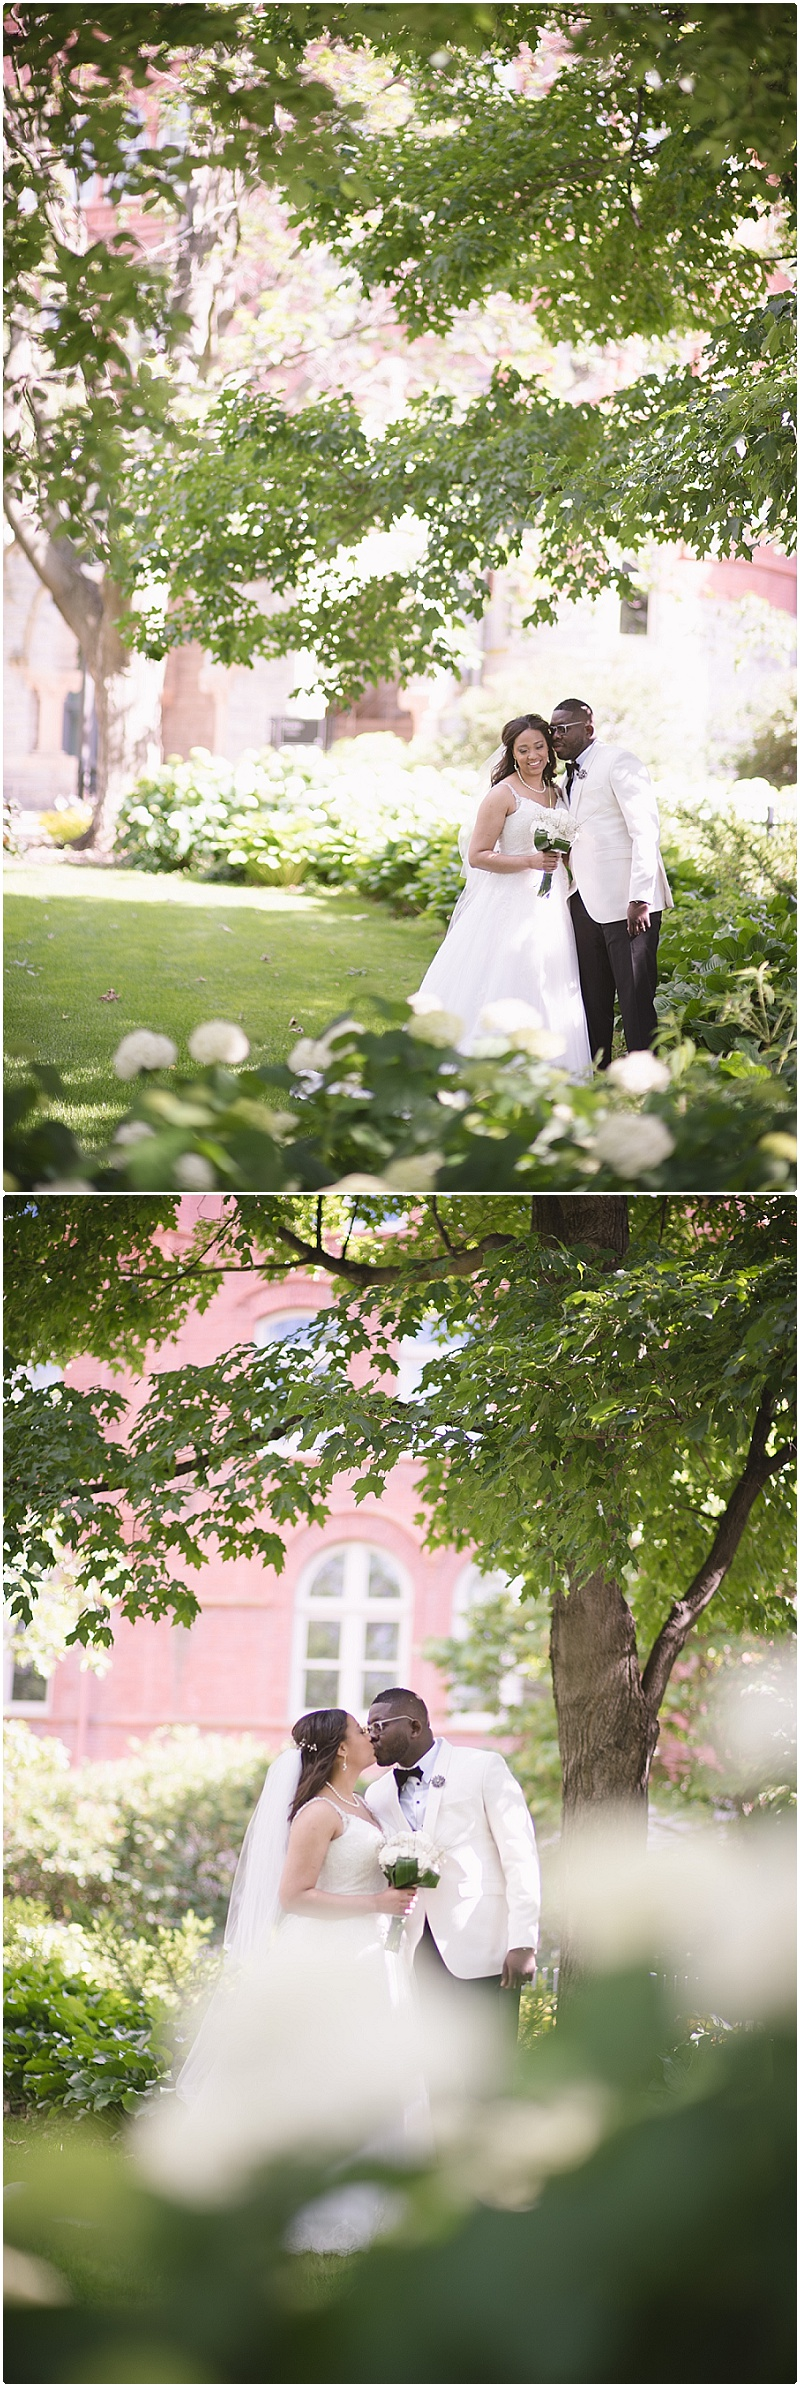 Gianna's Photography Macalester Wedding St. Paul Minnesota (13).jpg